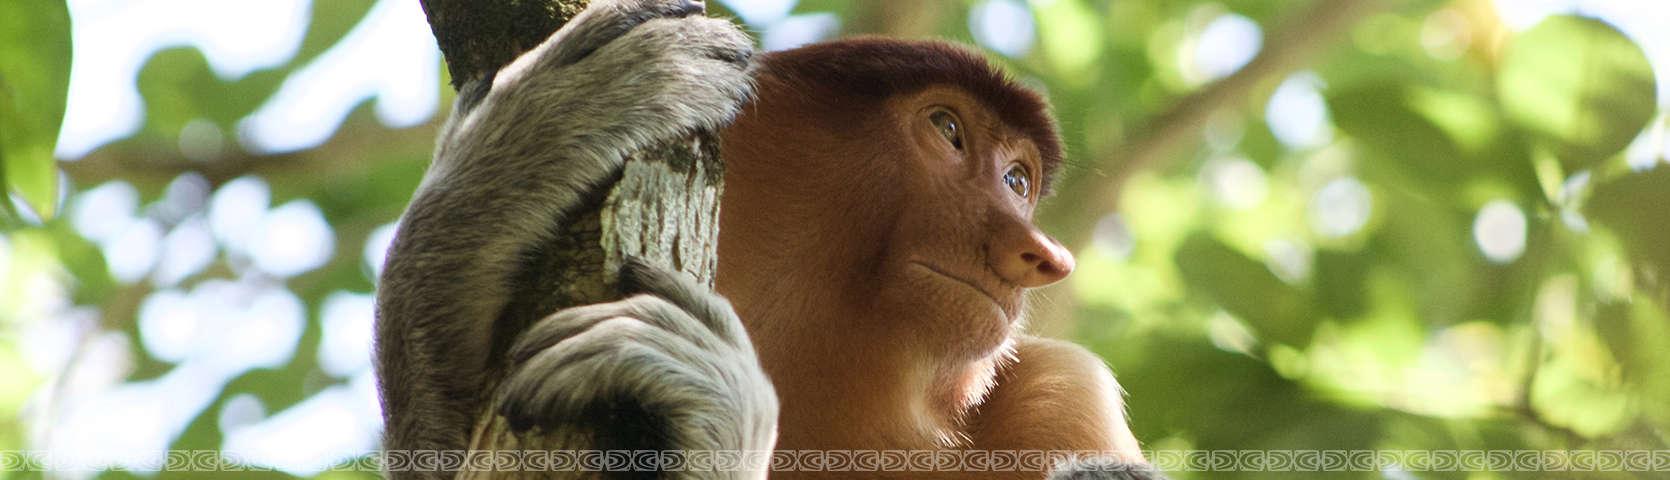 proboscis monkeys 2